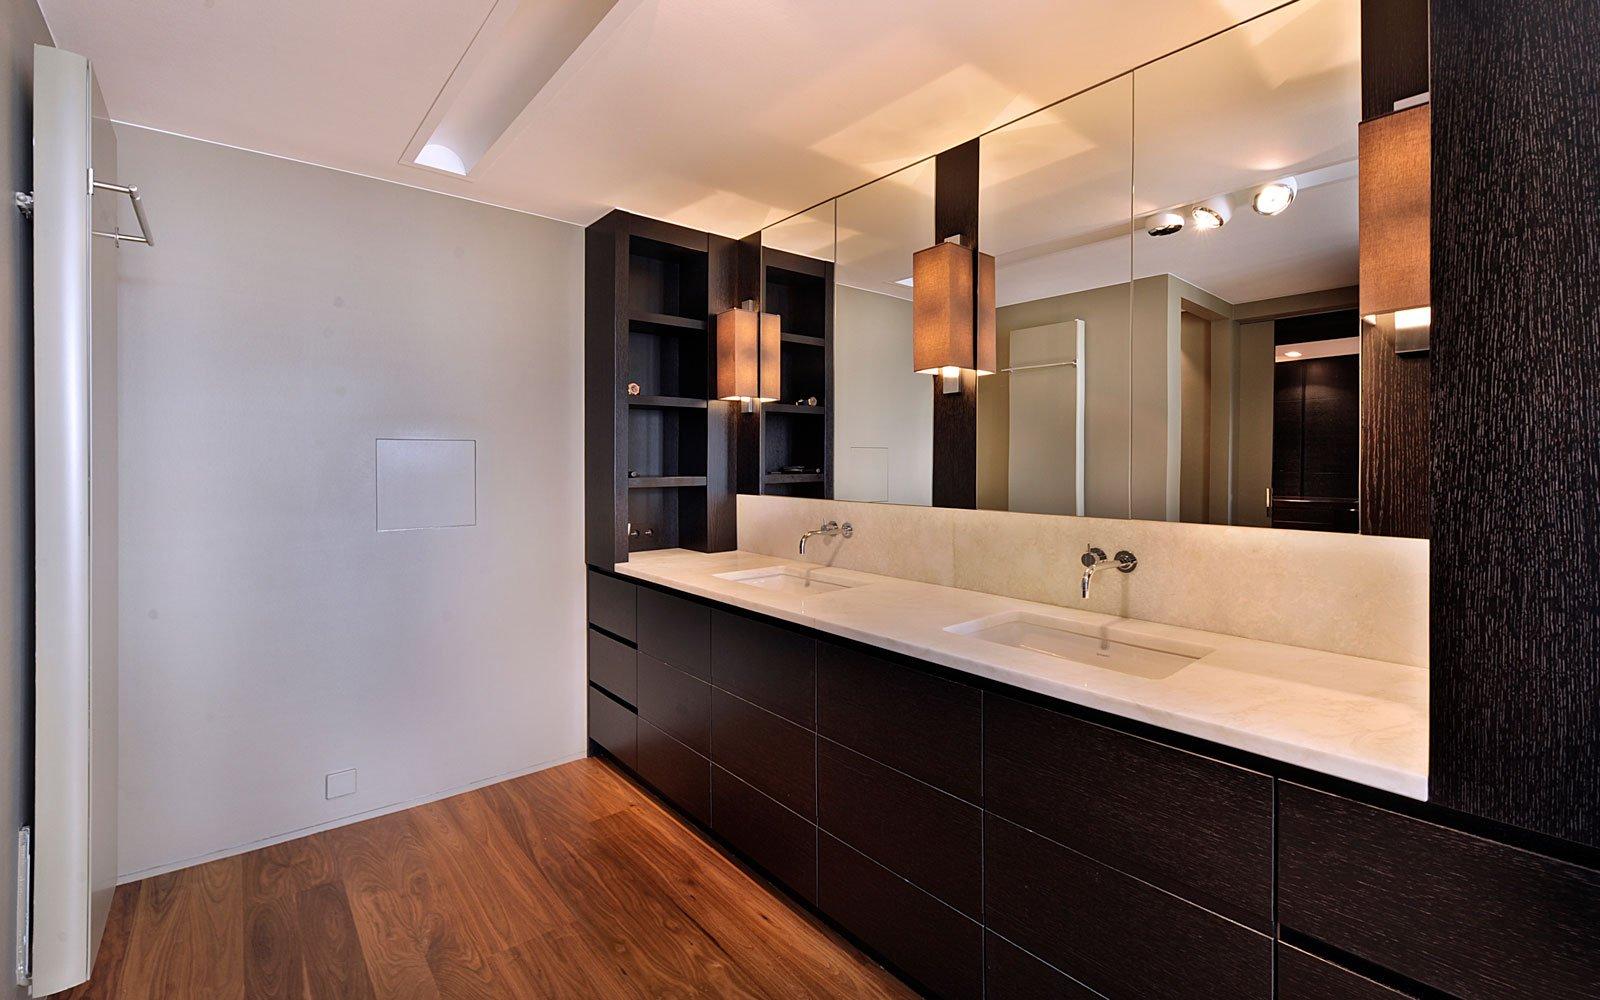 Badkamer, wastafel, grote spiegel, houten vloer, klassieke villa, Bart François